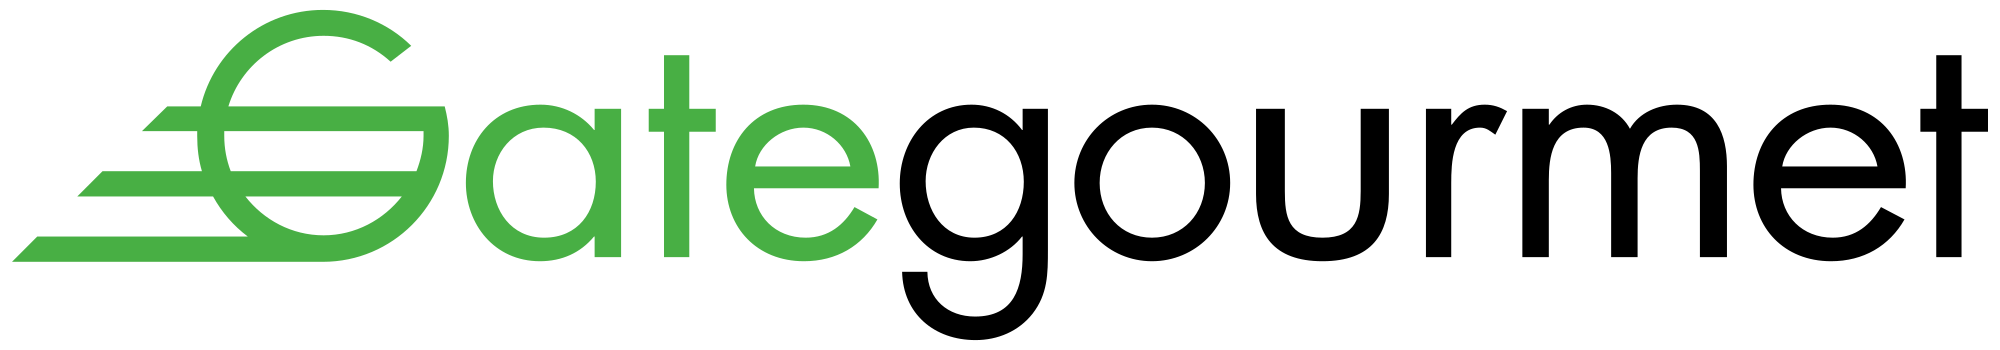 Gate_Gourmet_logo.svg.png